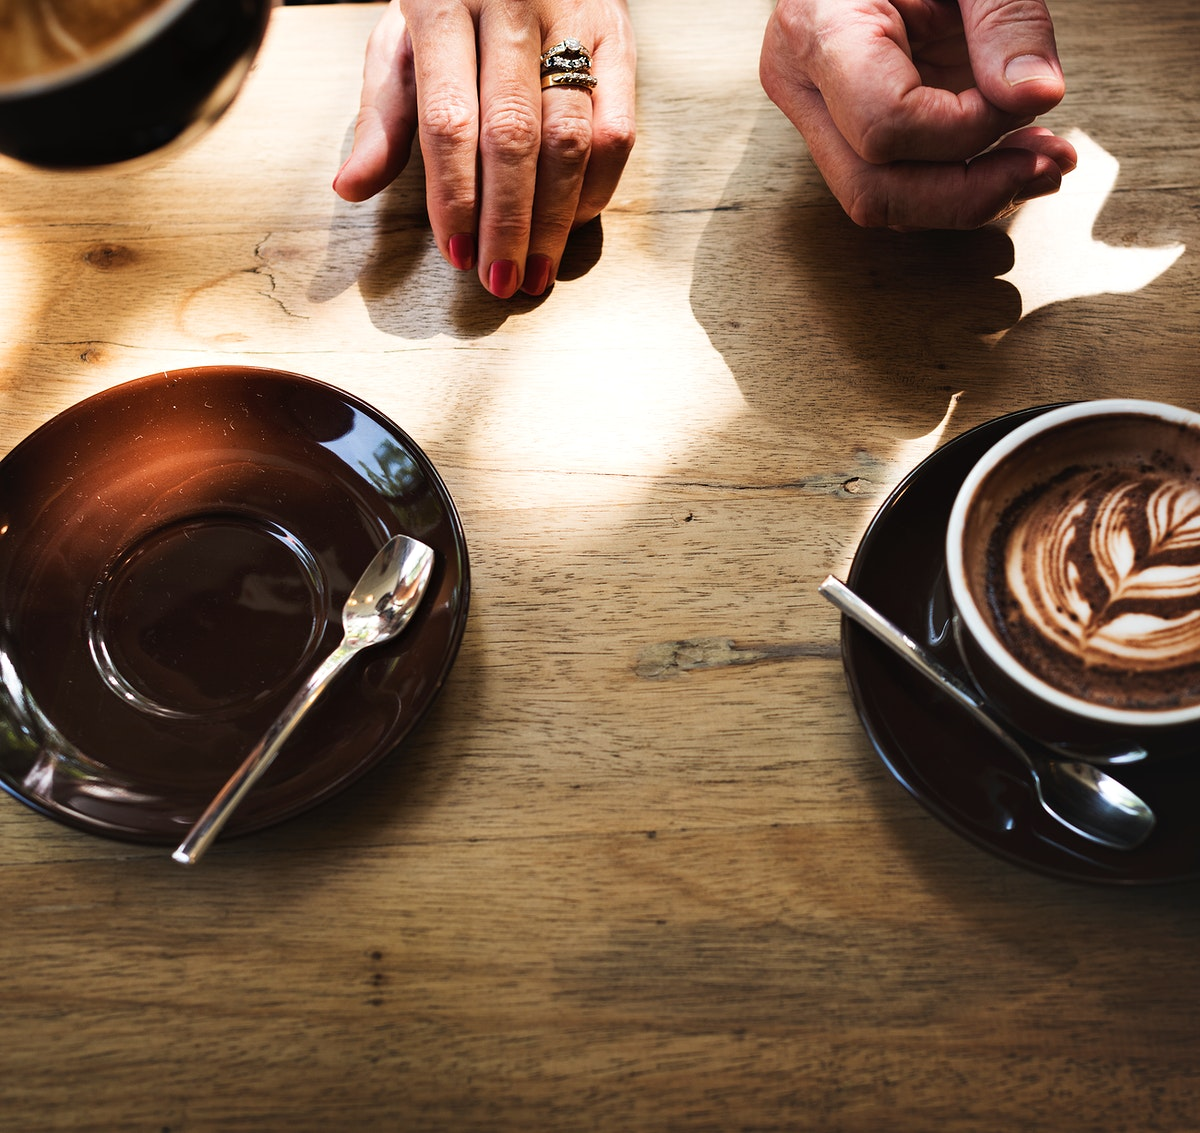 Coffee foam froth art on wooden table